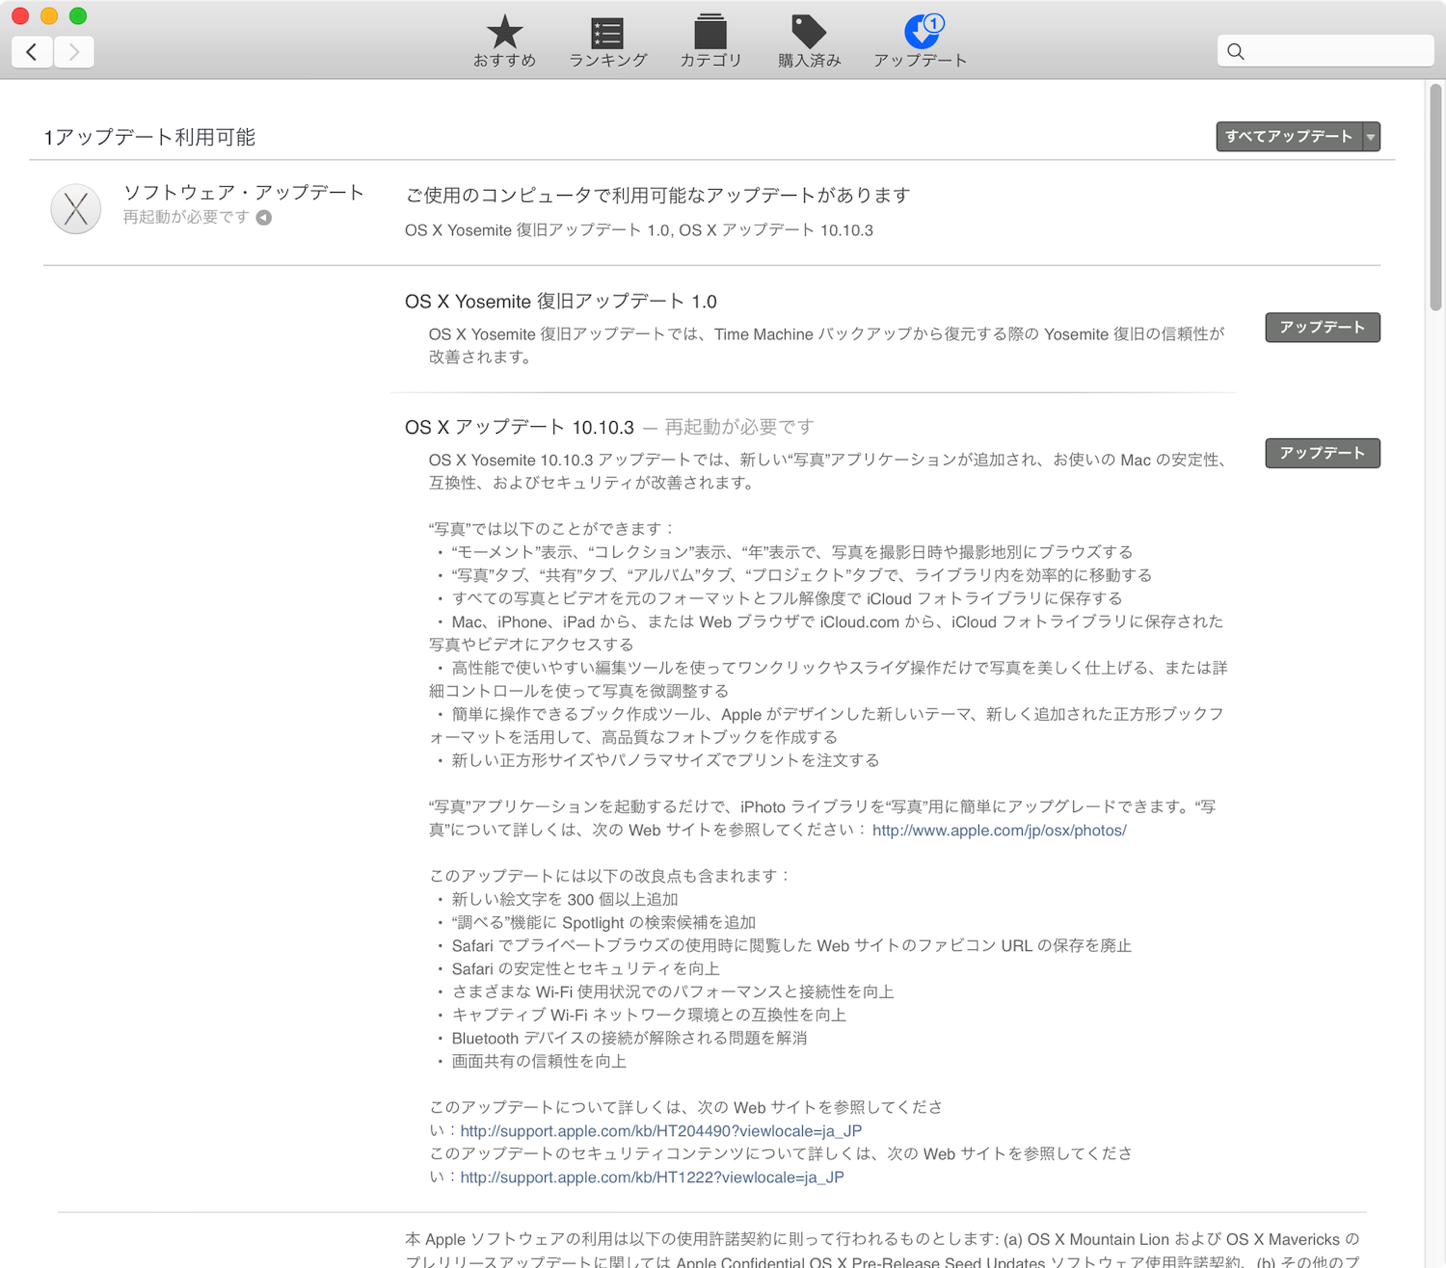 OS X Yosemite 10.10.3 正式リリース